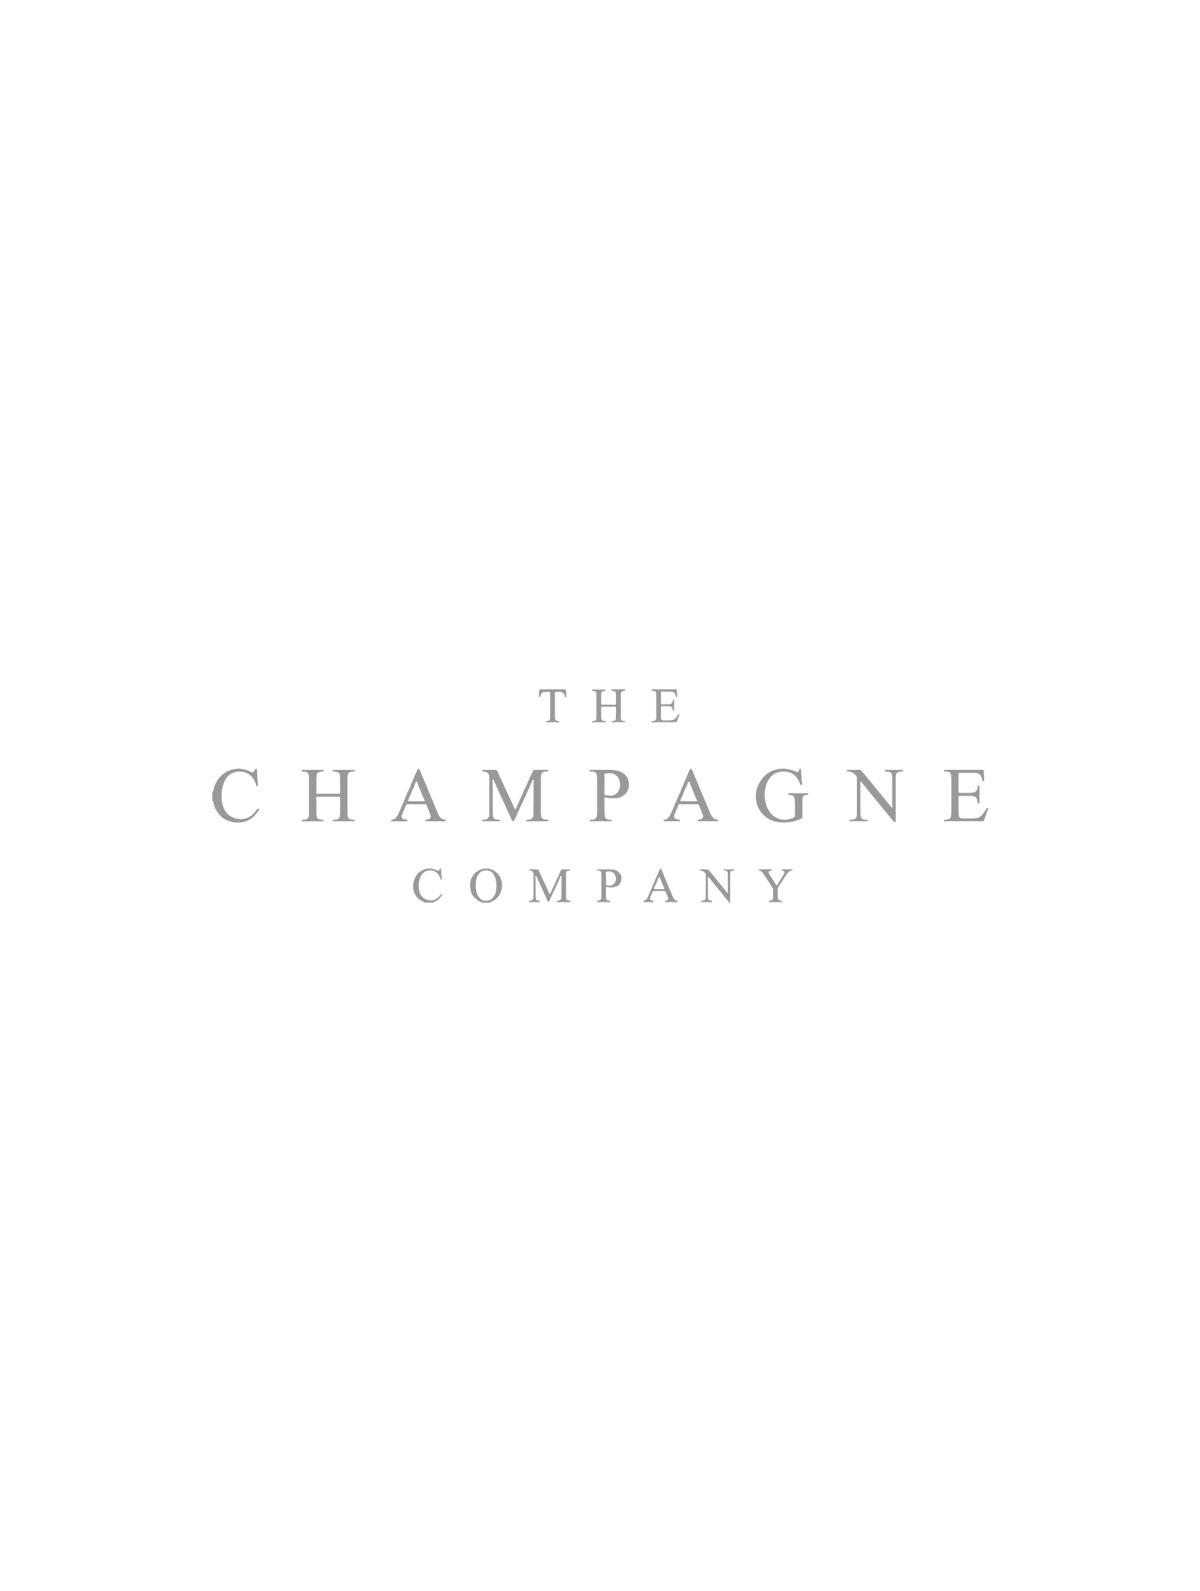 Ardbeg Uigeadail Islay Single Malt Scotch Whisky 70cl Gift Box